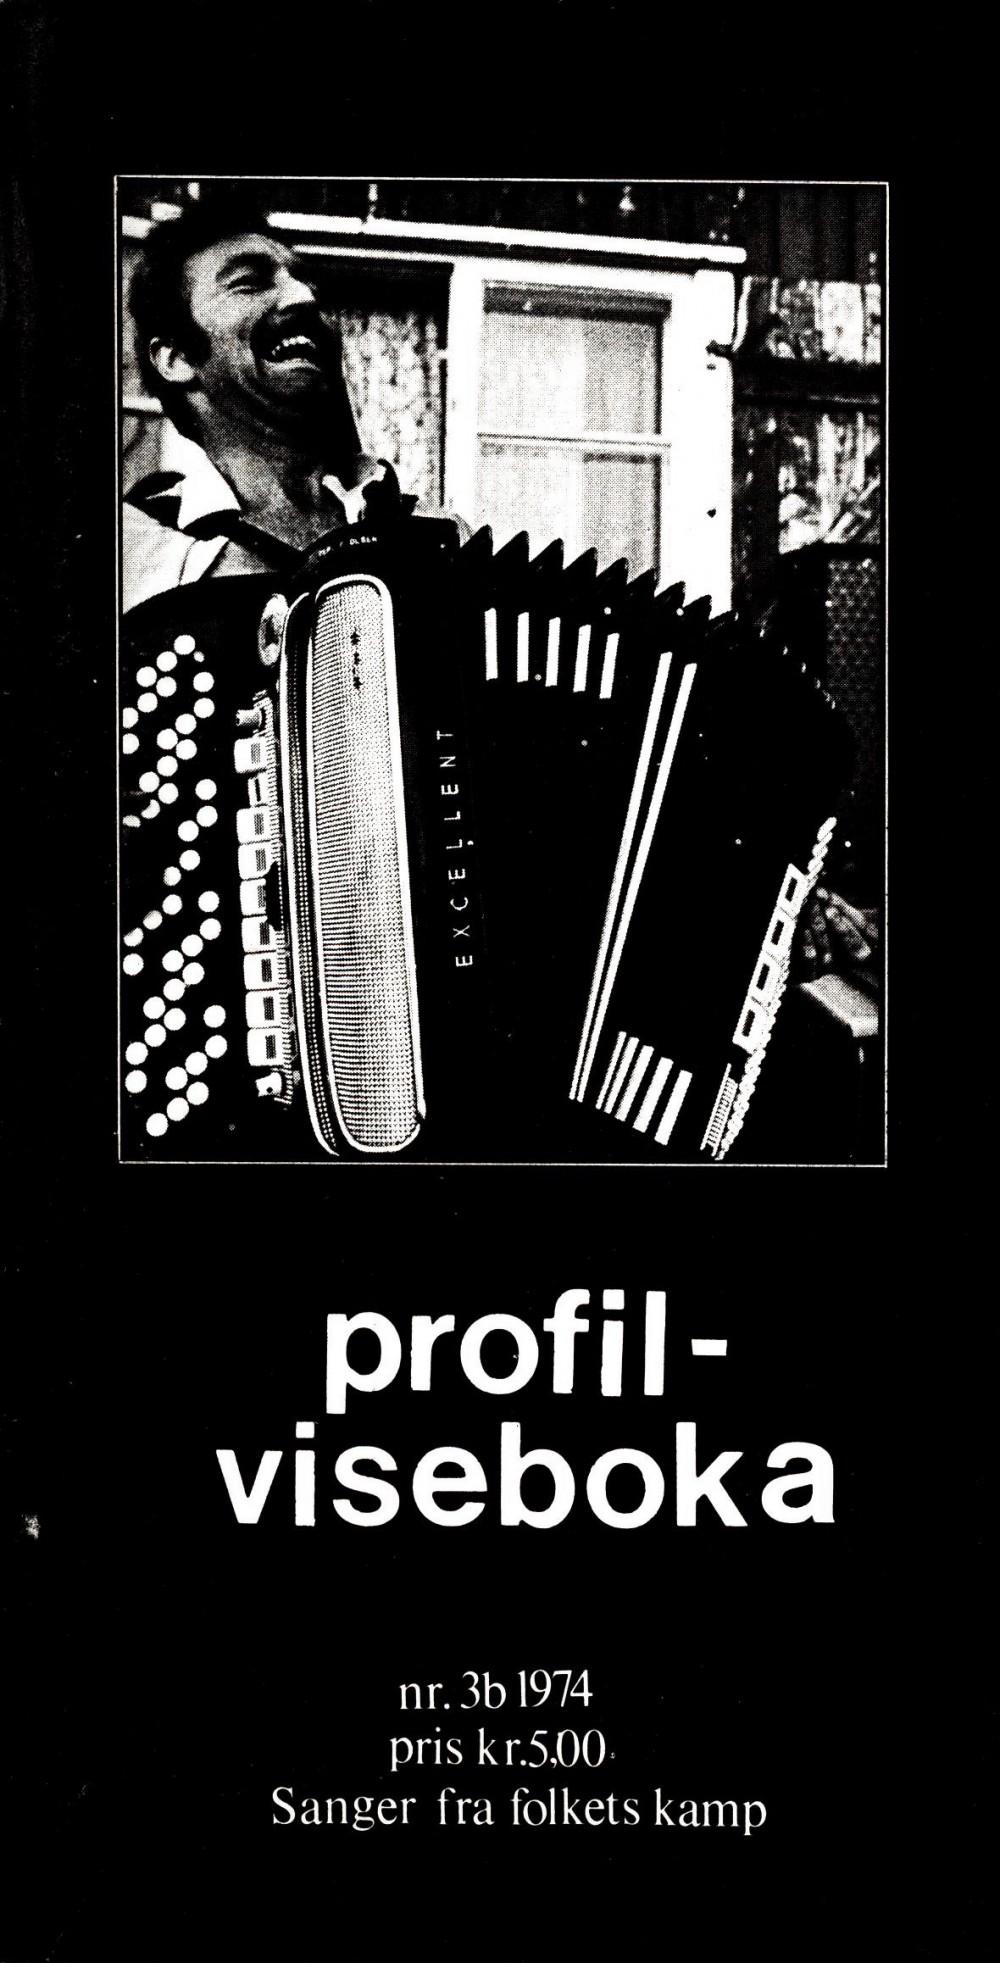 Profil-viseboka - Sanger fra folkets kamp - Profil nr. 3b 1974